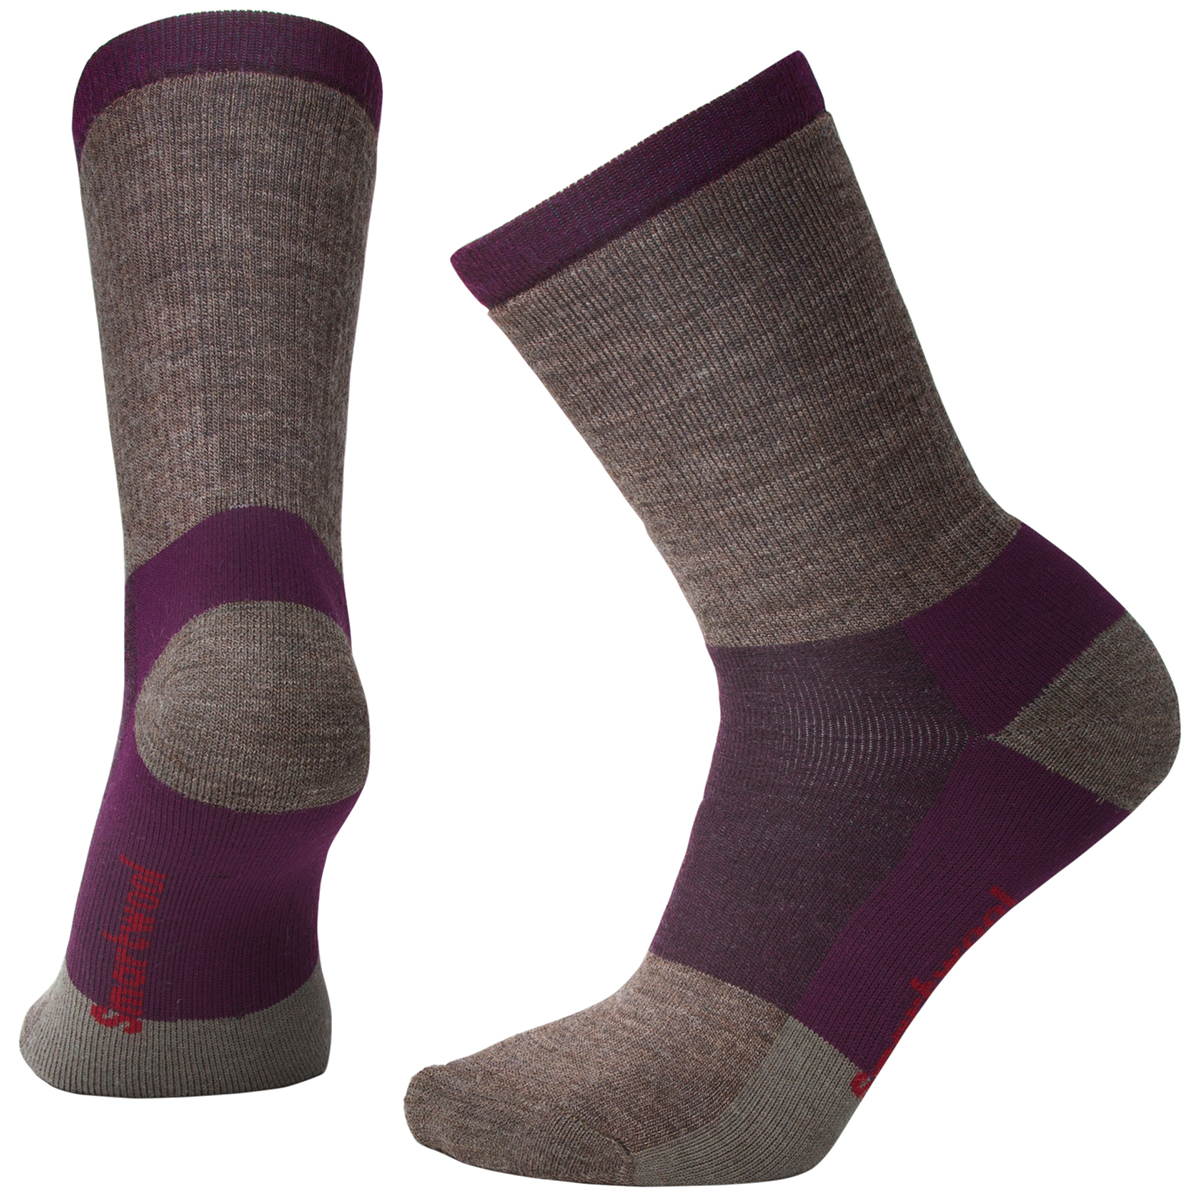 Smartwool Women's Striped Hike Medium Crew Socks - Red, M